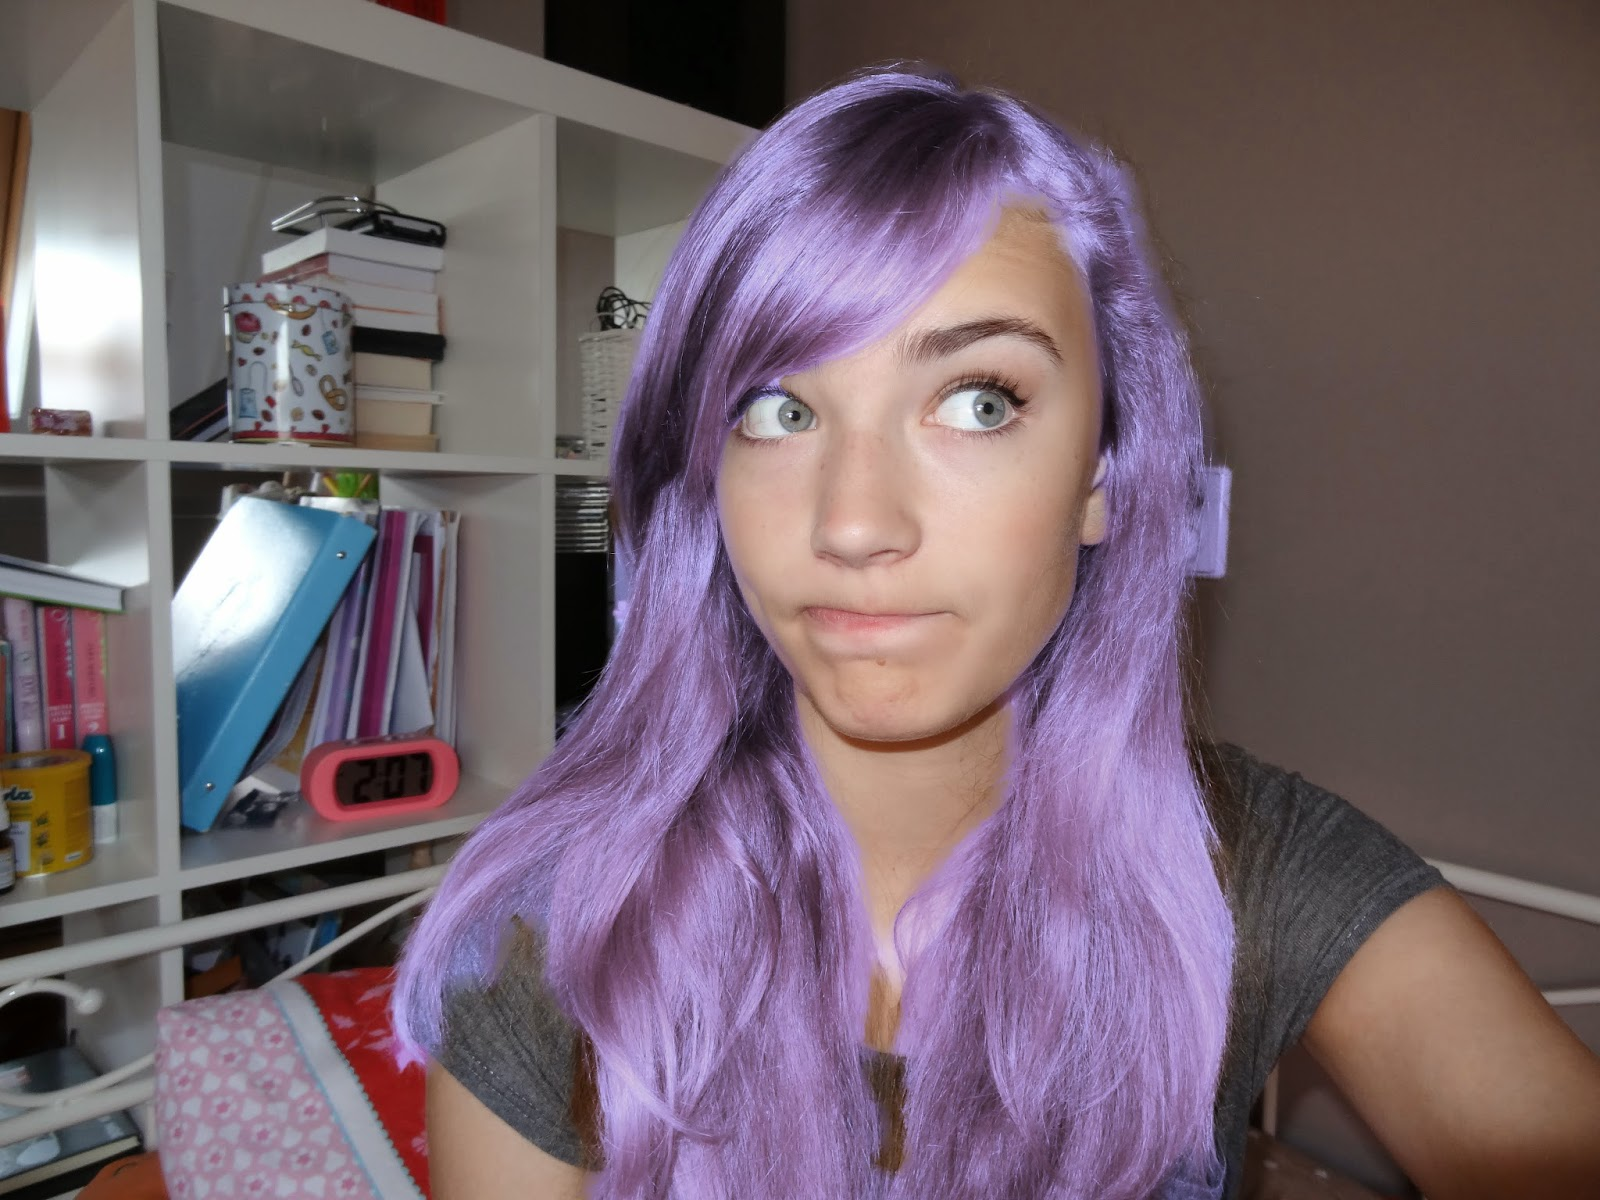 Pastel teal and purple hair